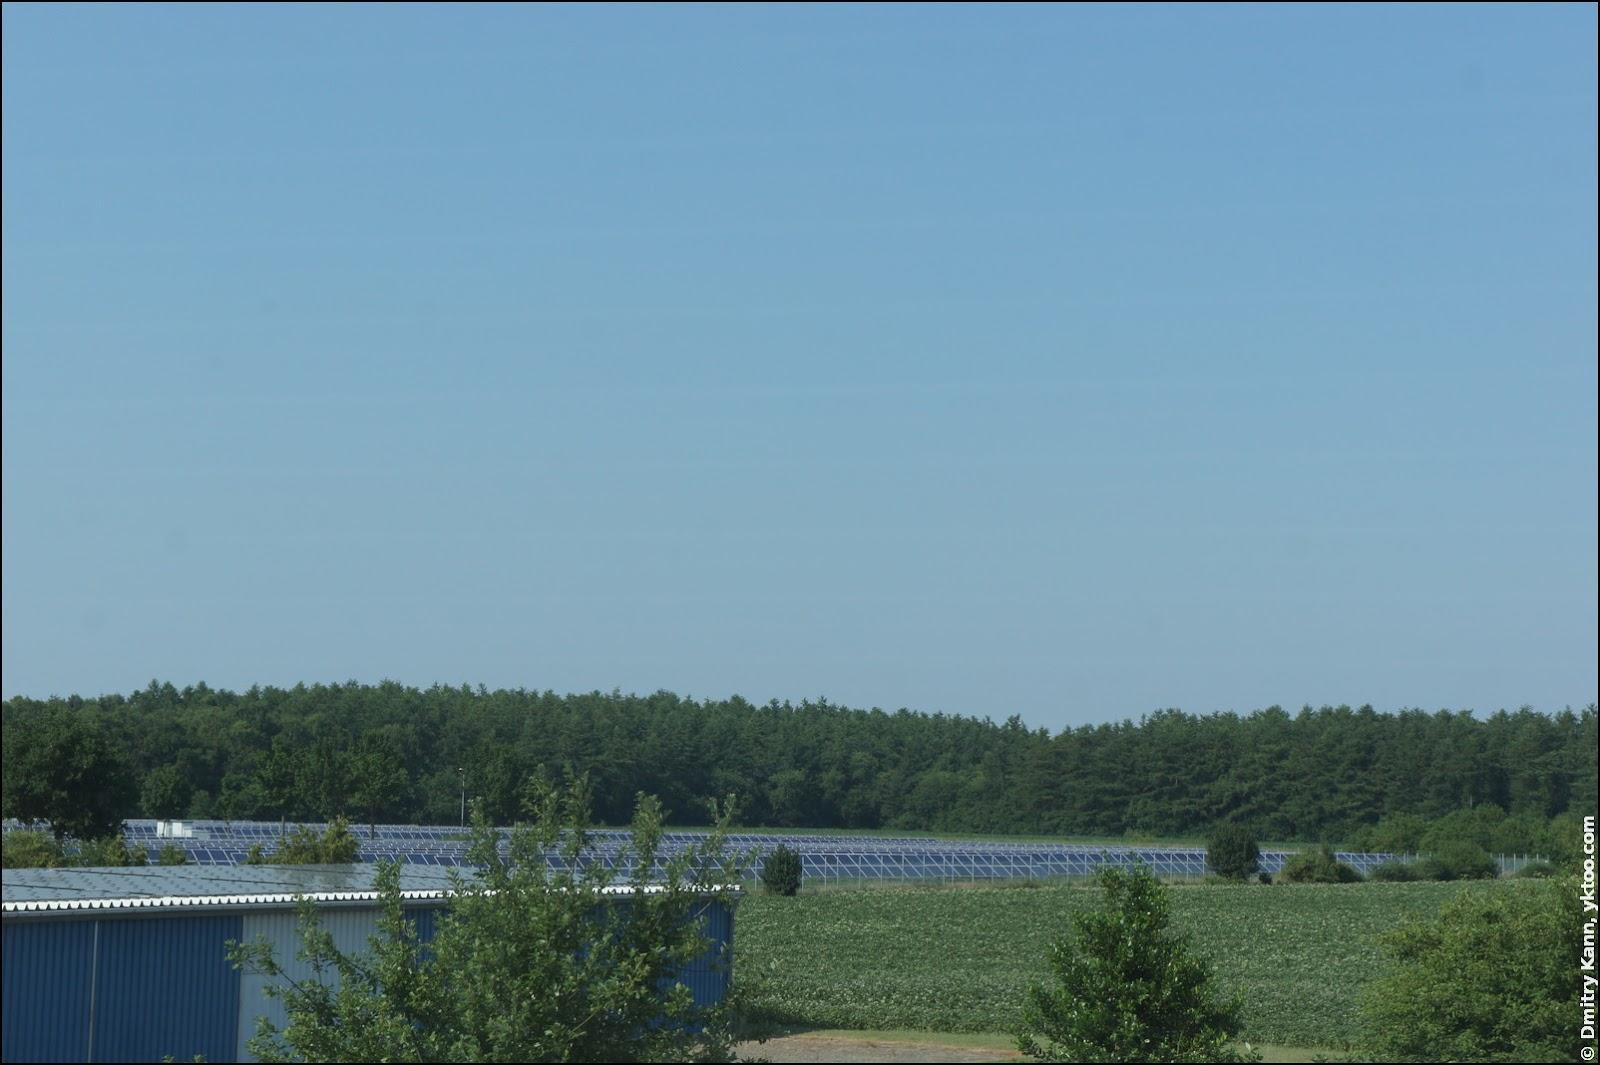 Solar farm near the airport.